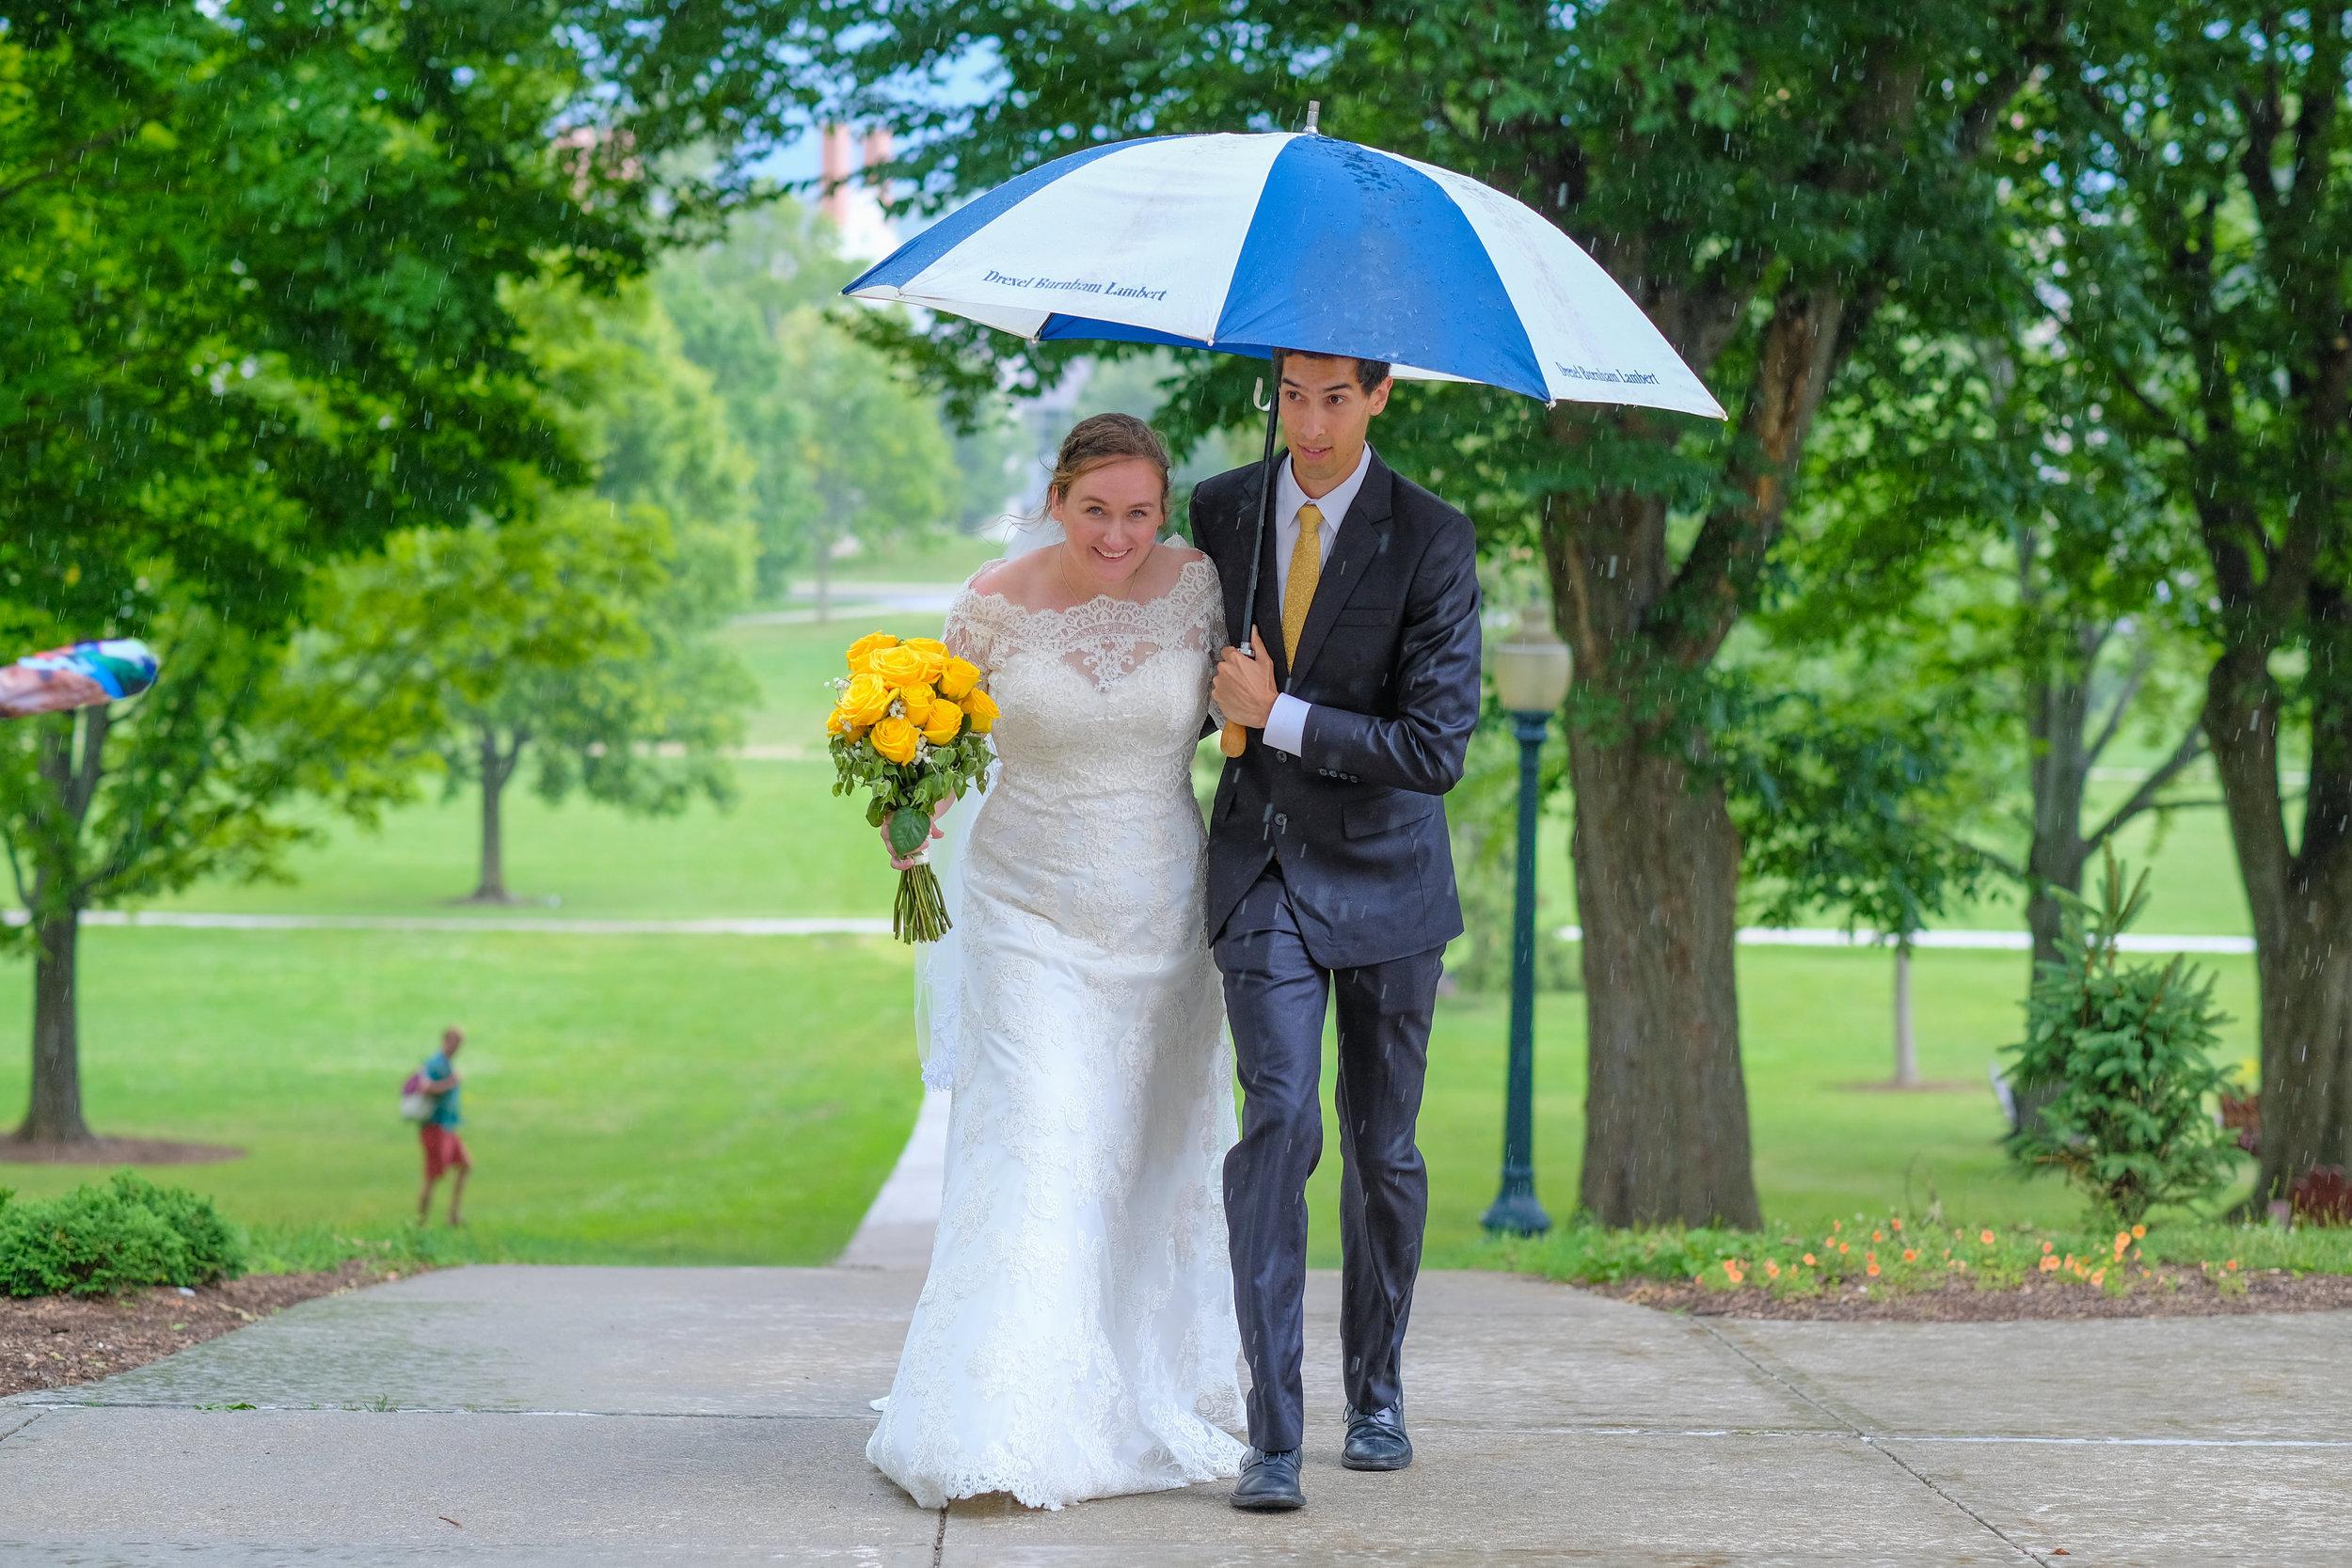 vermont-wedding-photography-849.jpg